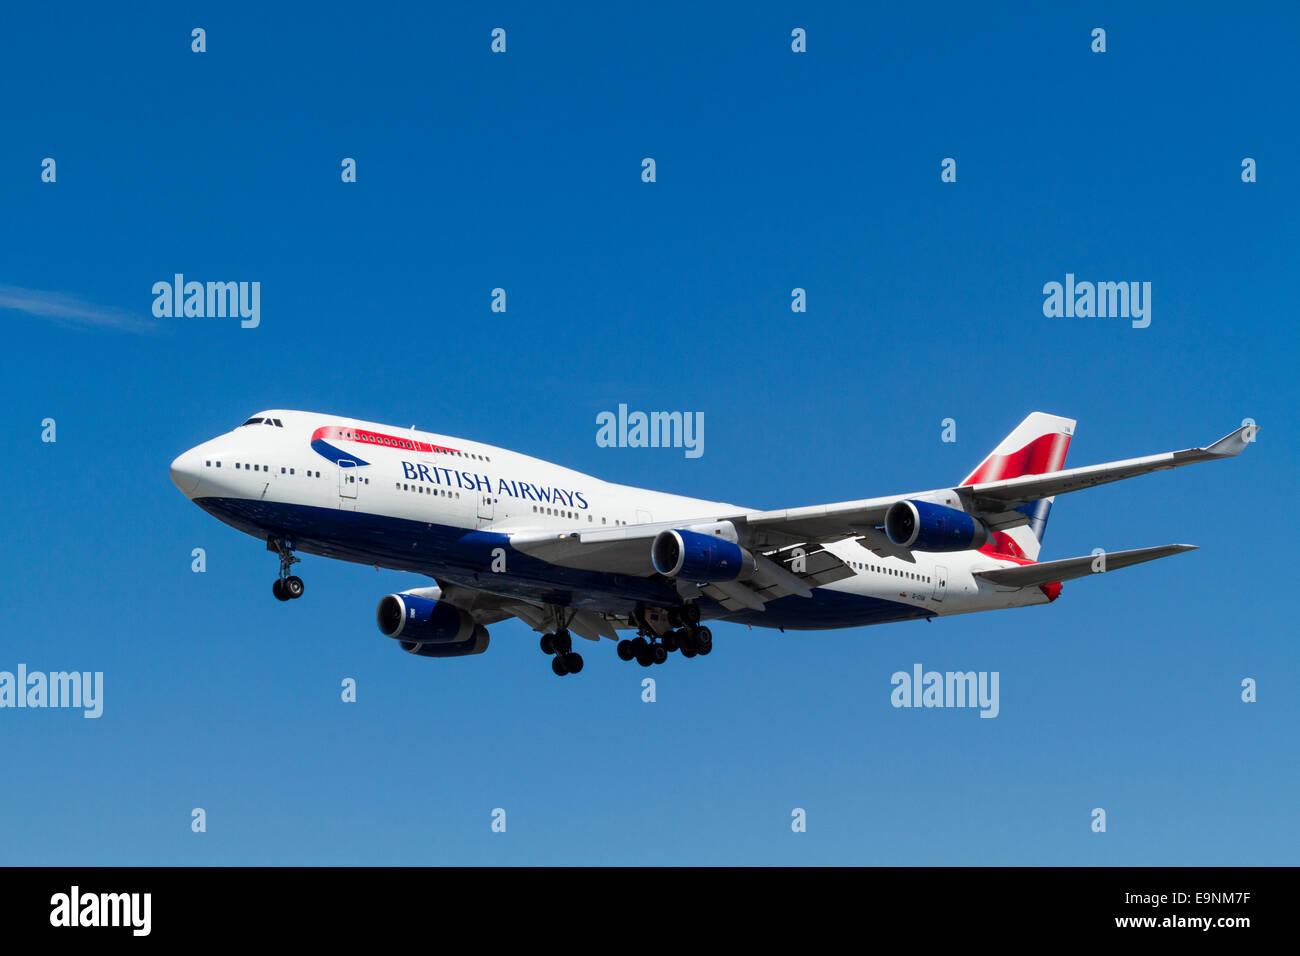 Boeing jumbo jet. British Airways 747-400 plane on its approach for landing at London Heathrow, England, UK Stock Photo